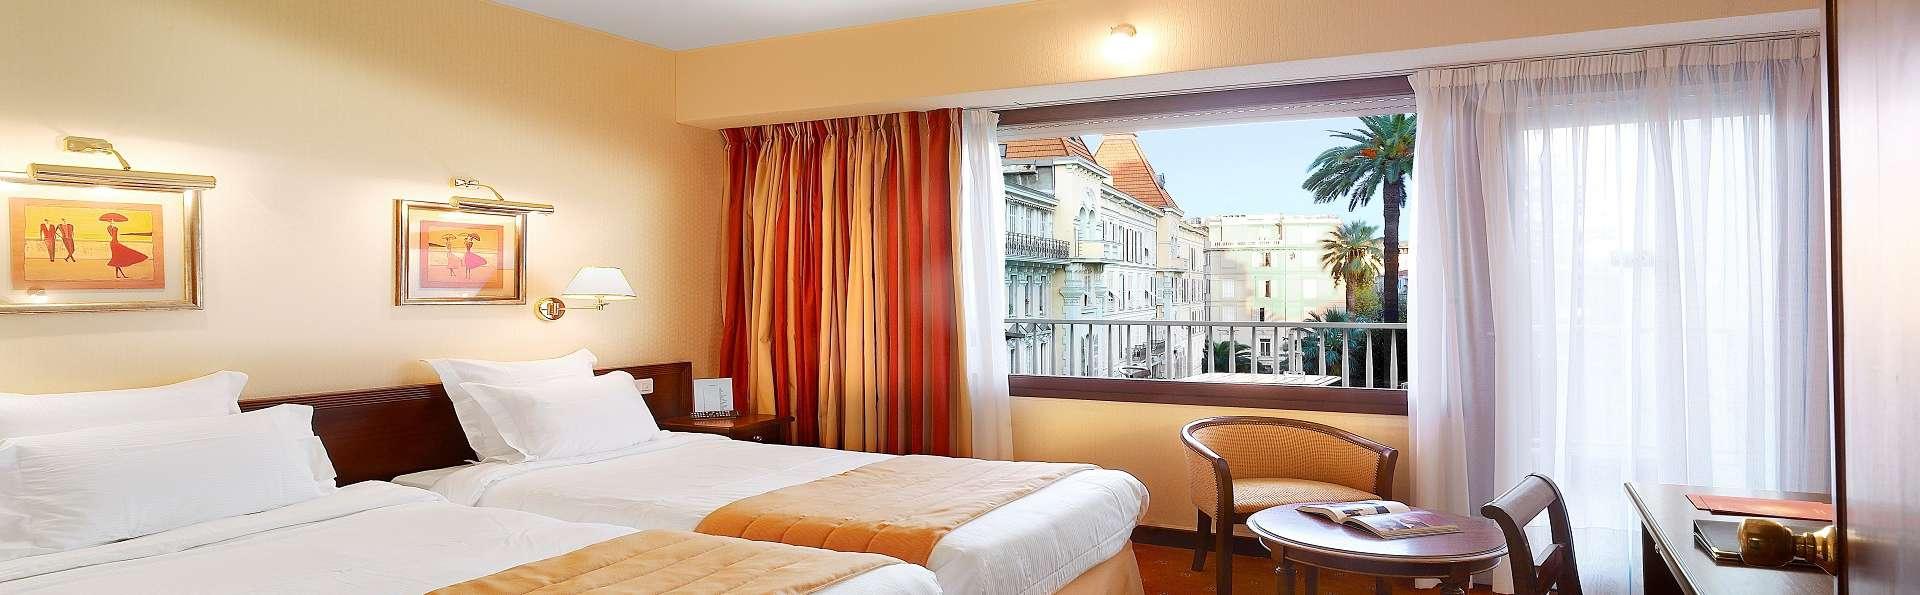 Splendid hôtel & Spa - CHAMBRE_STD_HARMONIE_TWB.jpg